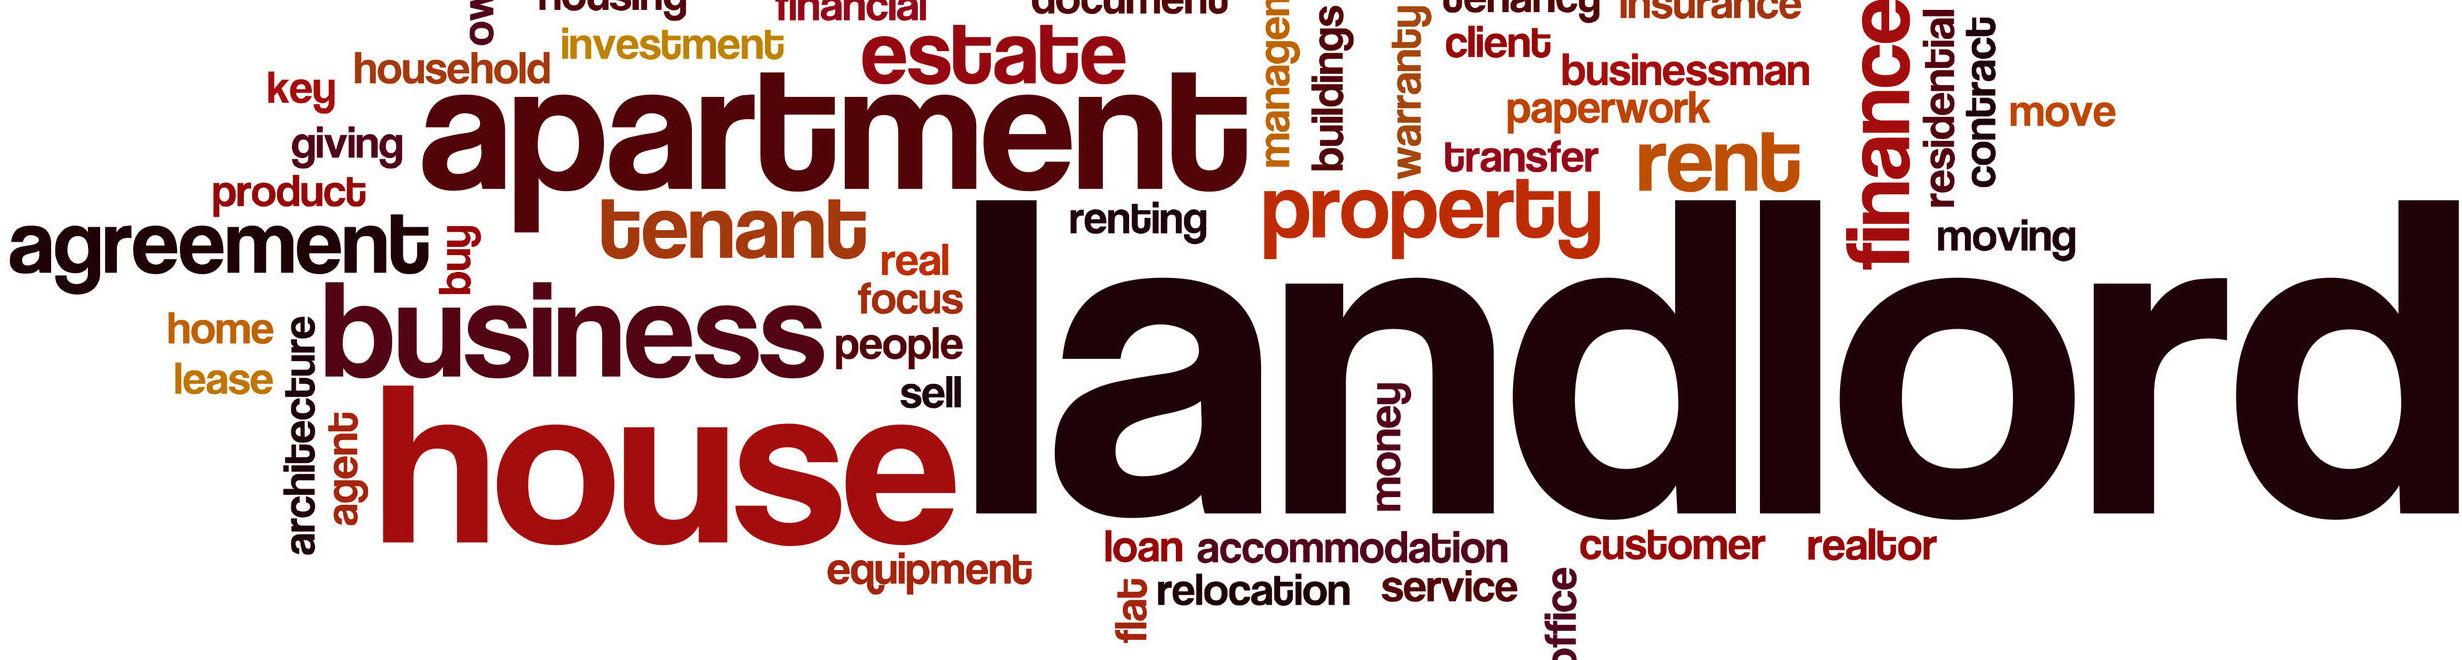 Tenancy Deposit Scheme - court decisions